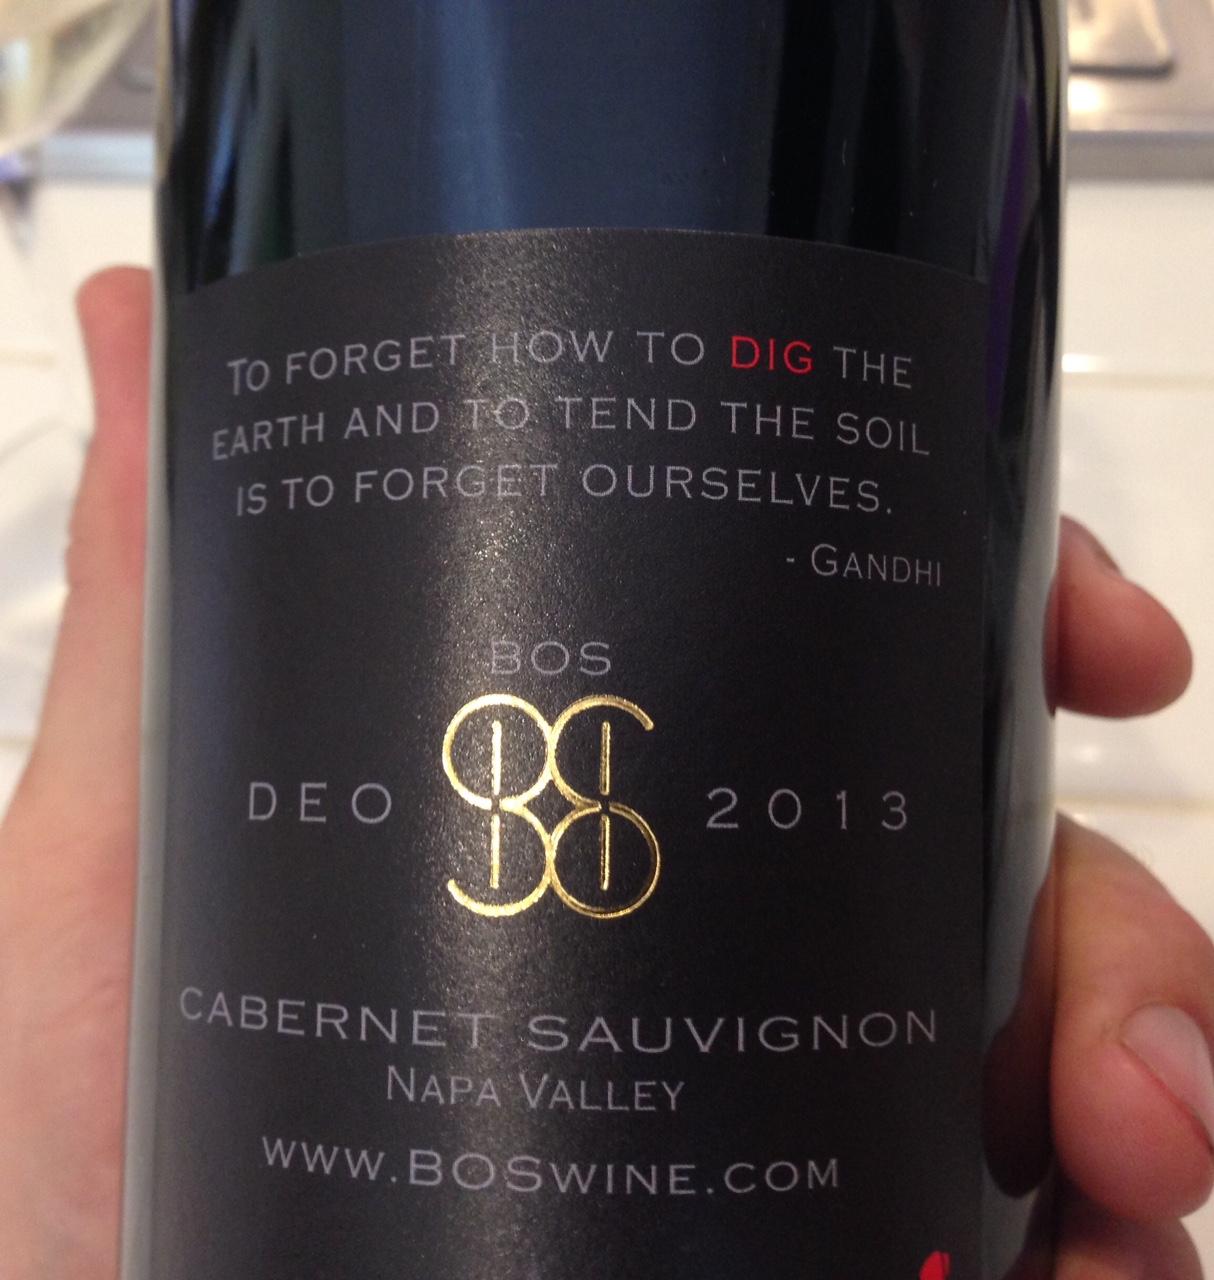 David Bos Deo Wine Label.jpg